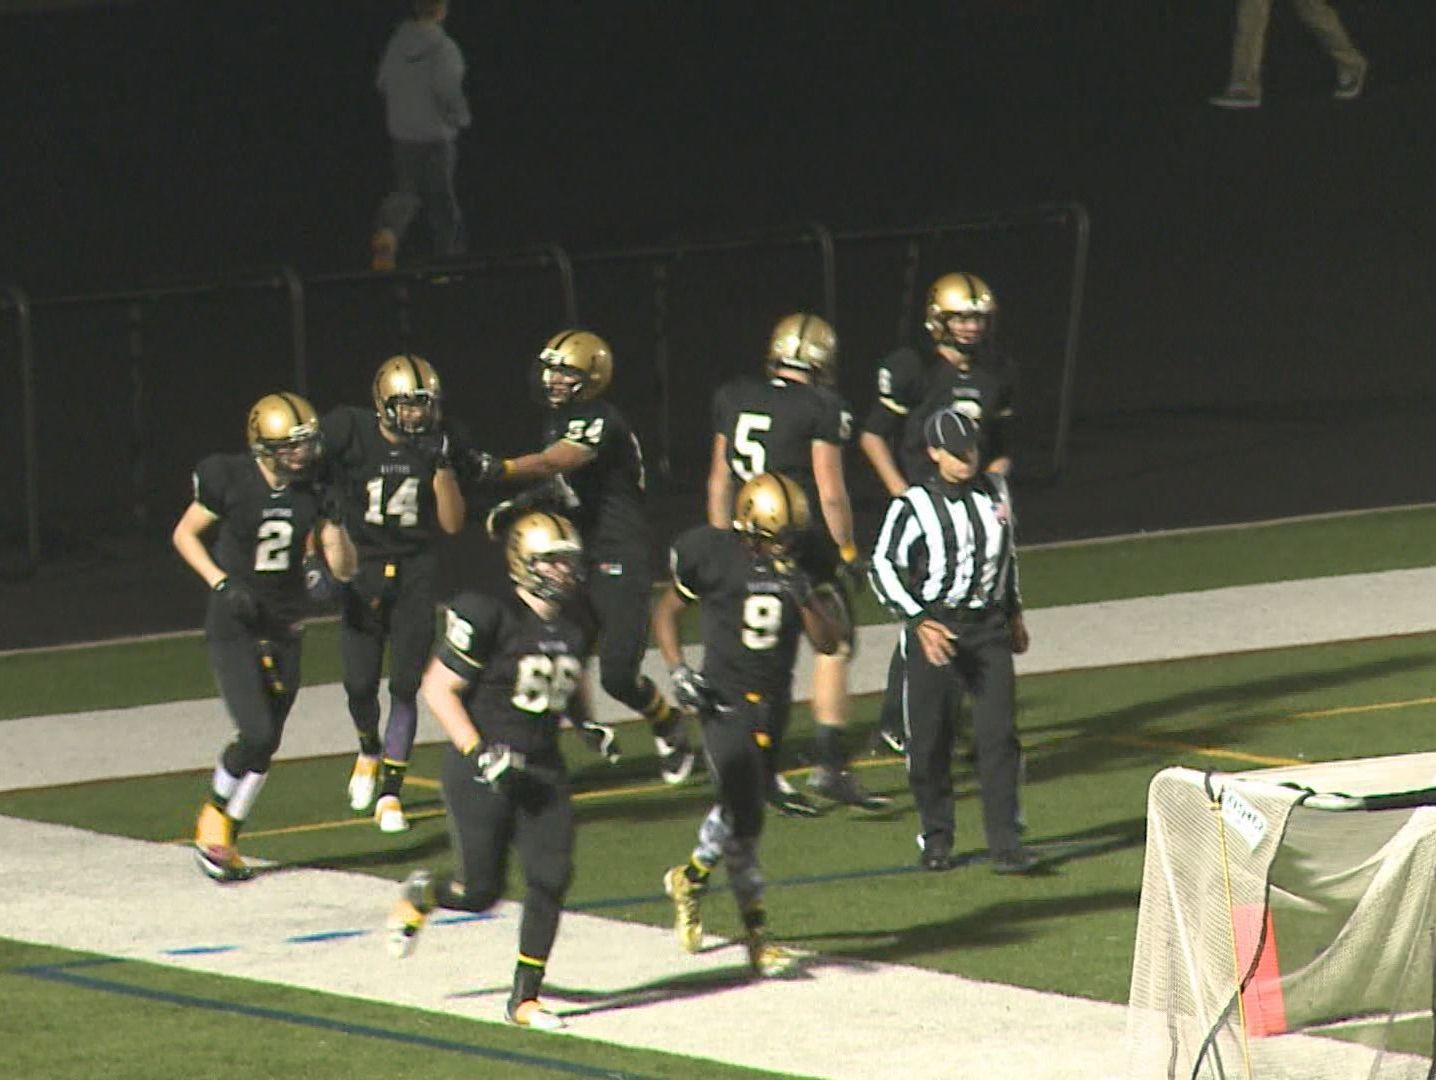 East Ridge High School football team during the 2014 season.